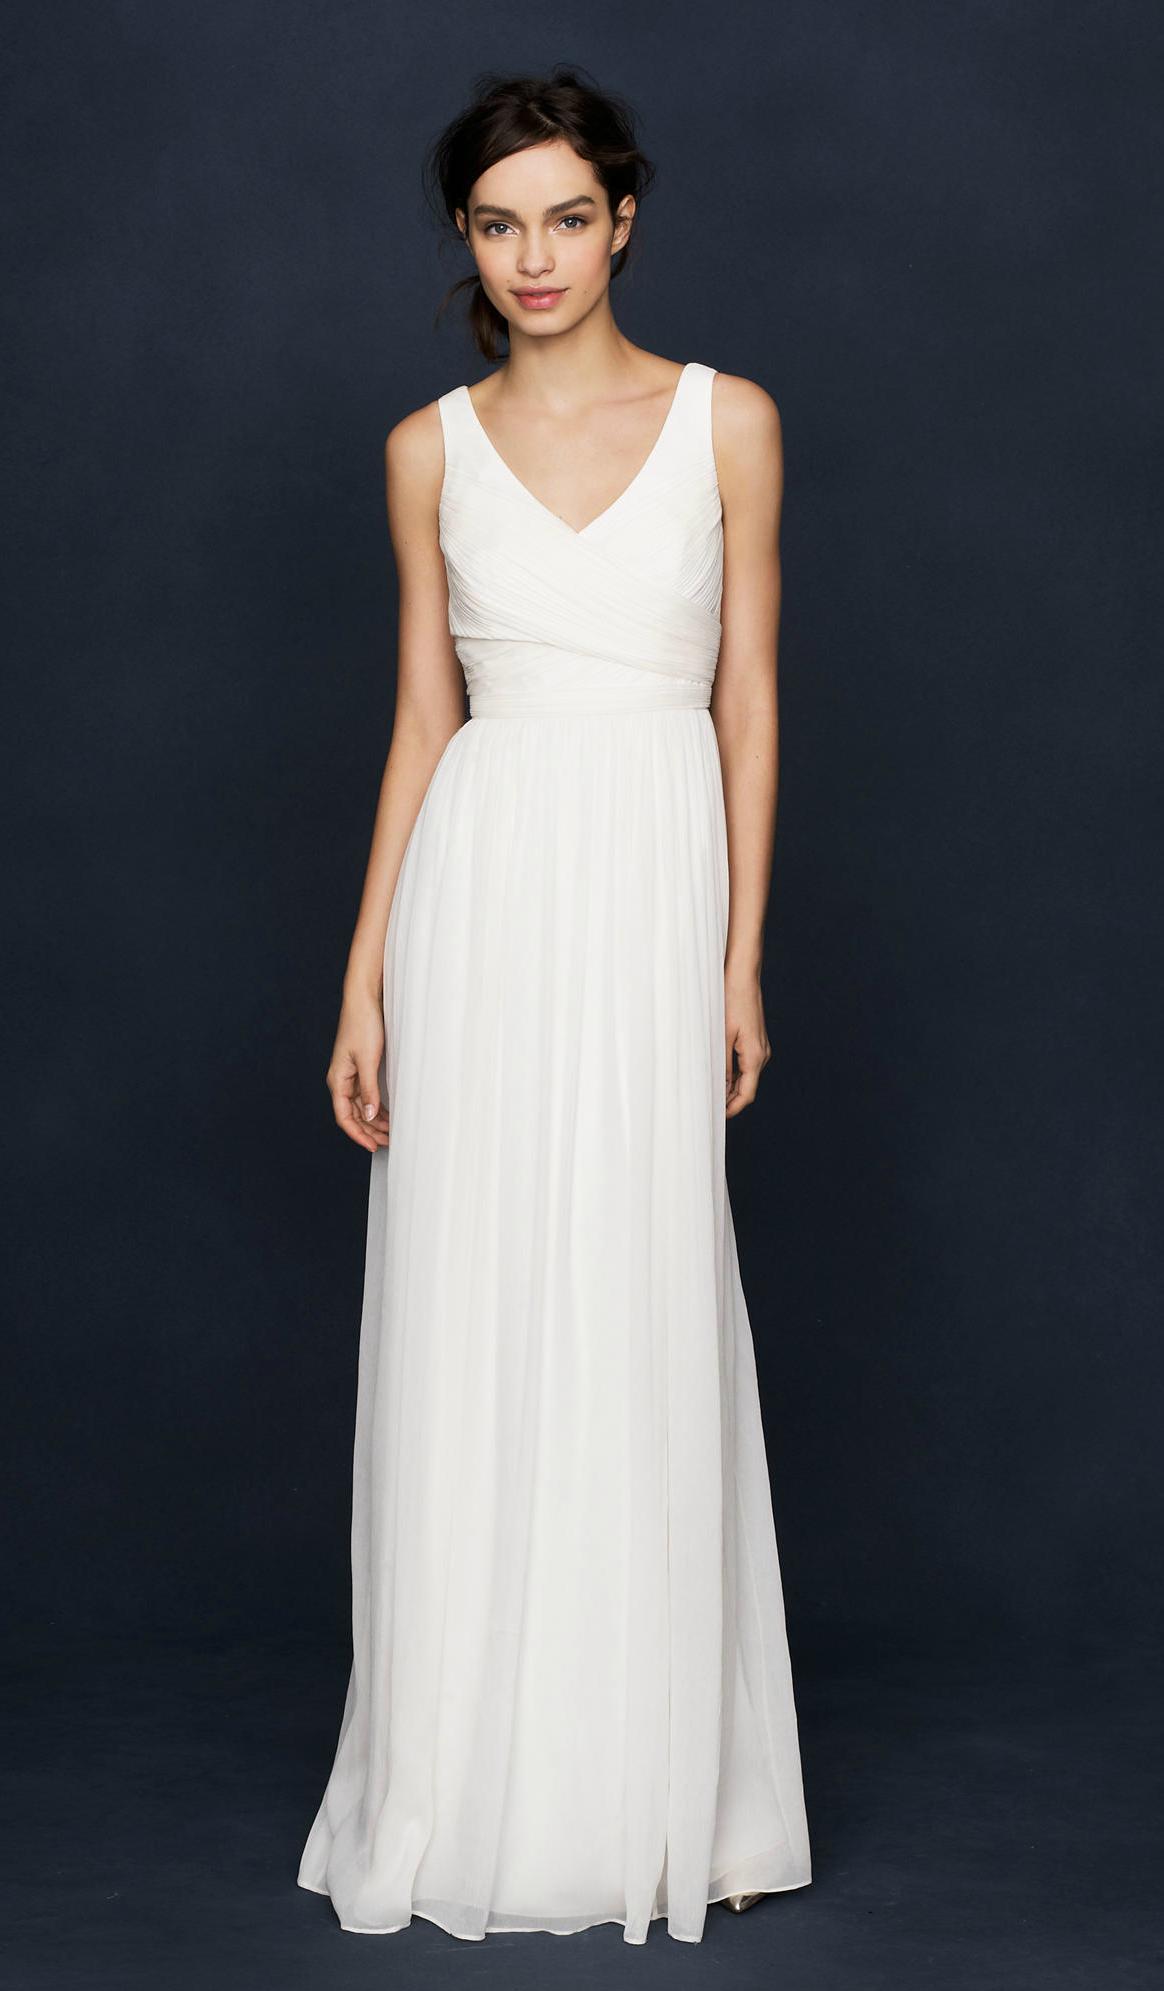 J Crew Wedding Dresses Heidi Chiffon Bridal Gown Petite Wedding Dress Cheap Wedding Dress Affordable Wedding Dresses